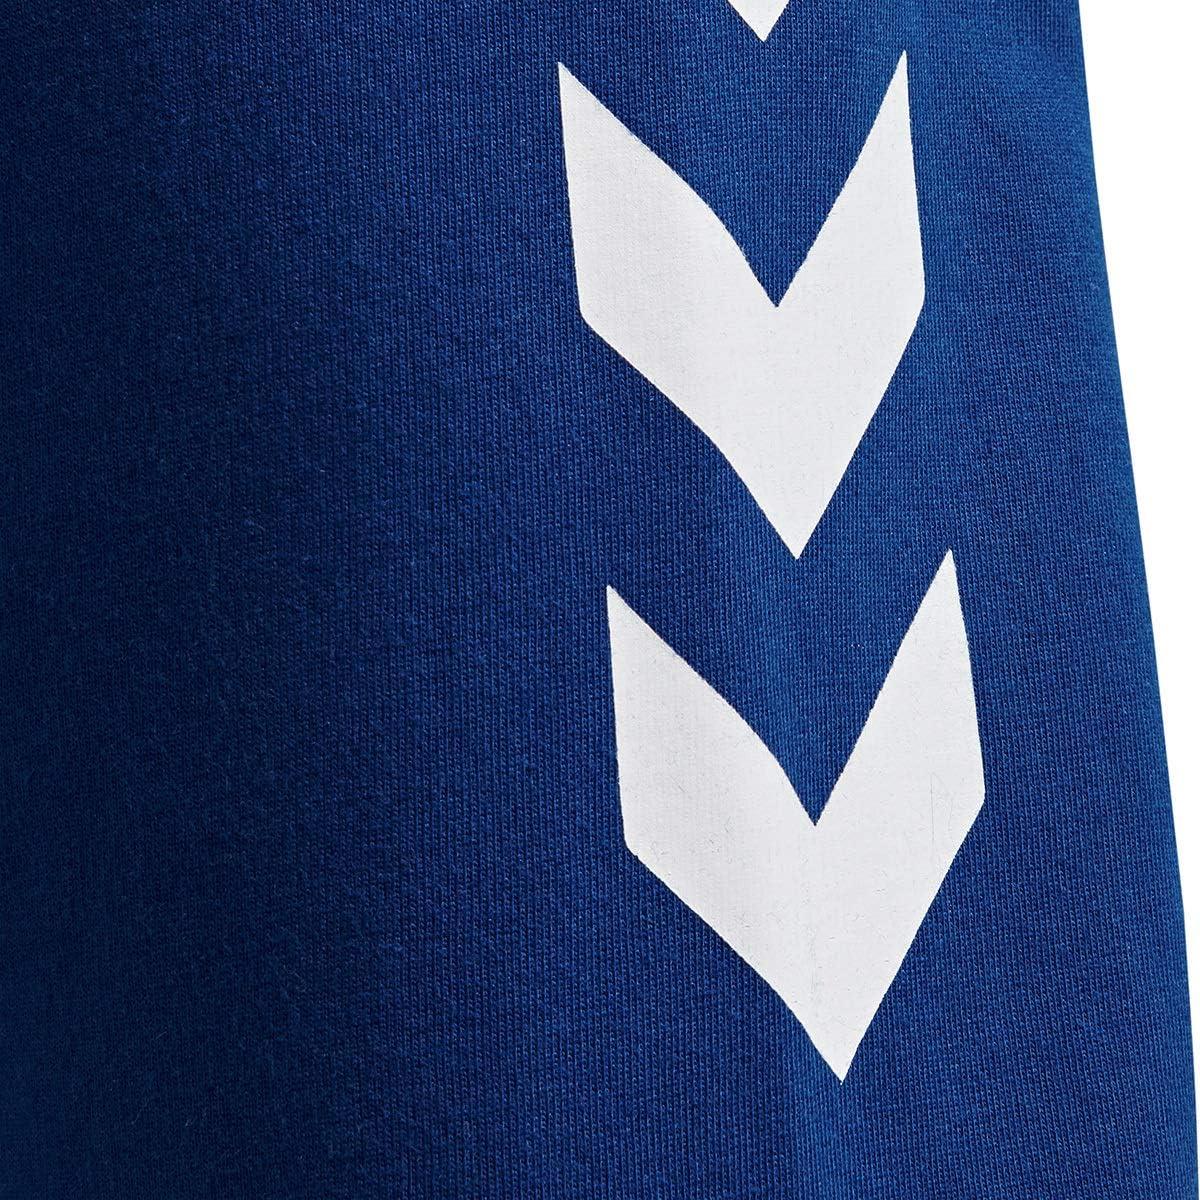 hummel Hmlgo Cotton Hoodie - Sweatshirt à Capuche - Homme True Bleu.